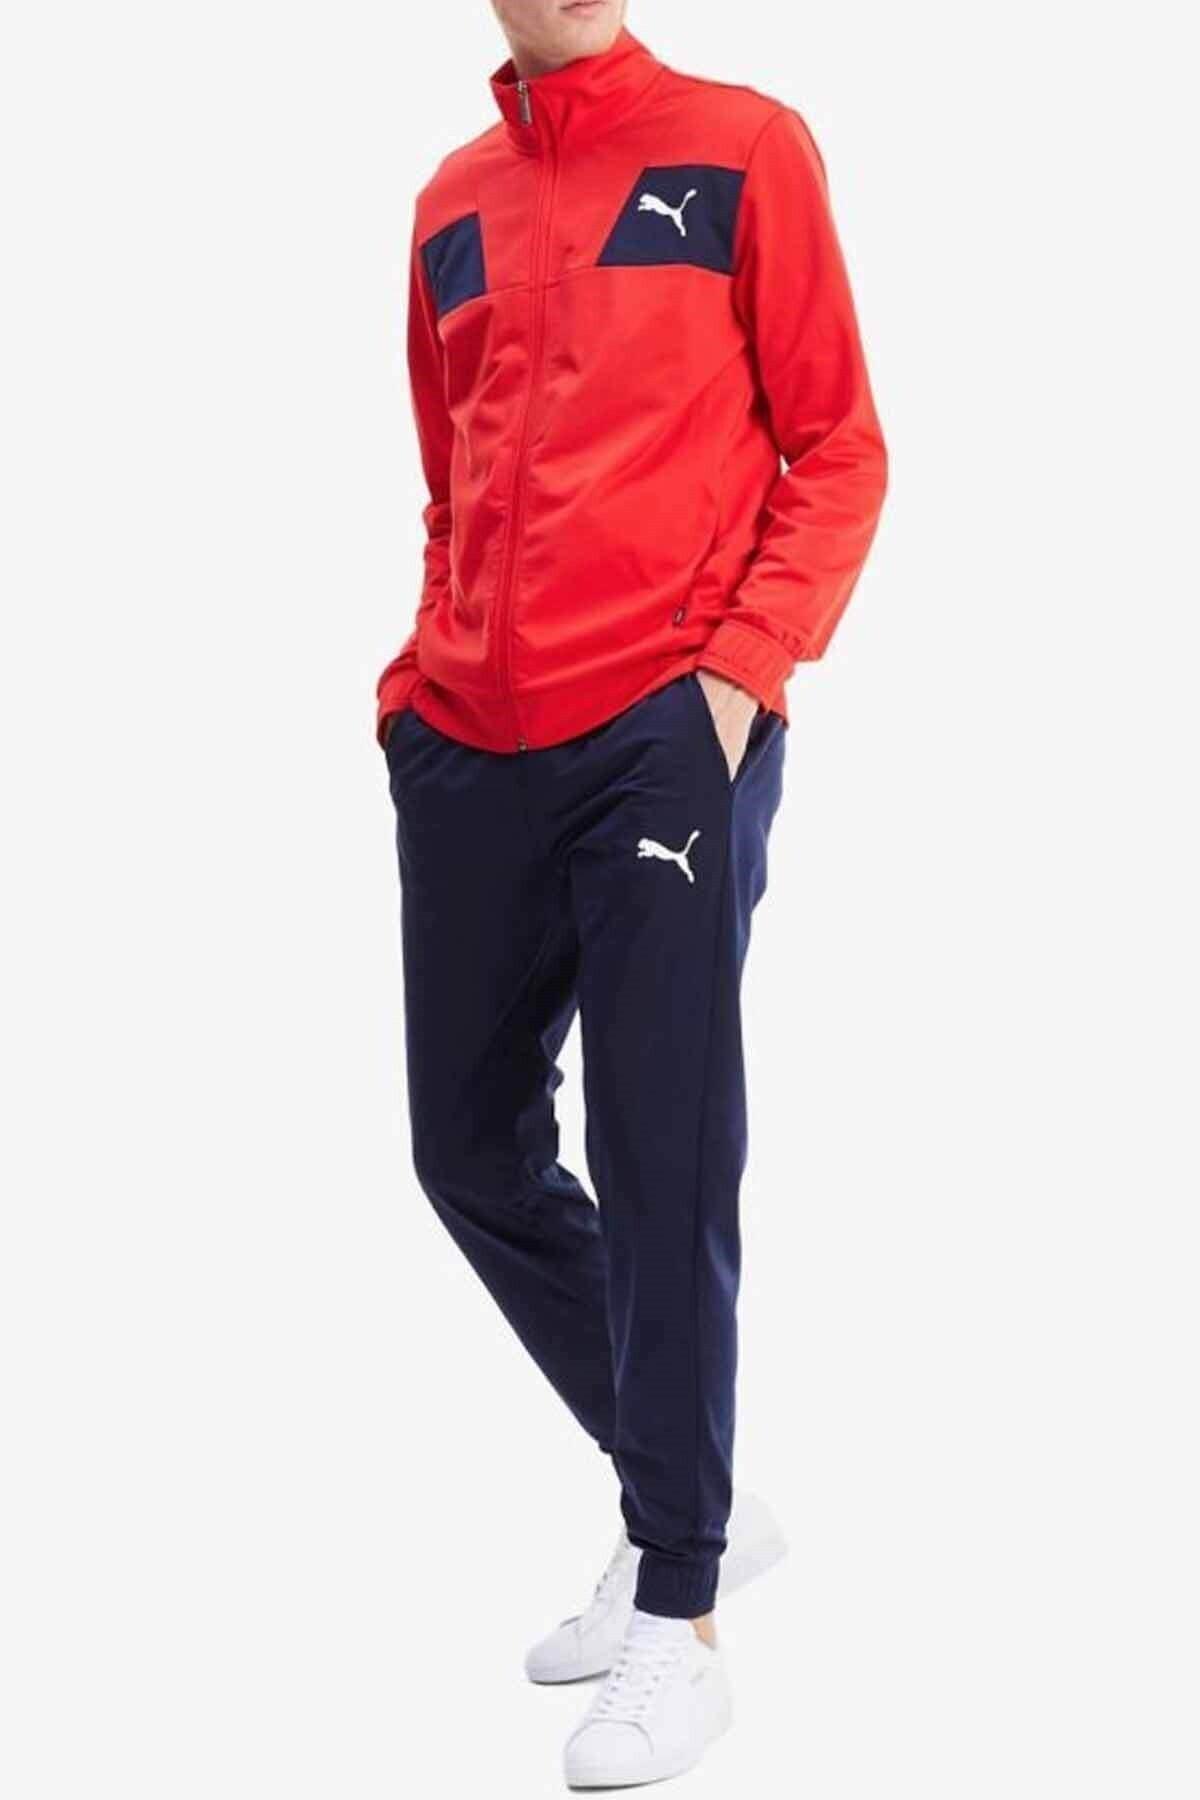 Puma Techstripe Tricot Suit Cl Erkek Eşofman Takım 583602 11-kırmızı 1